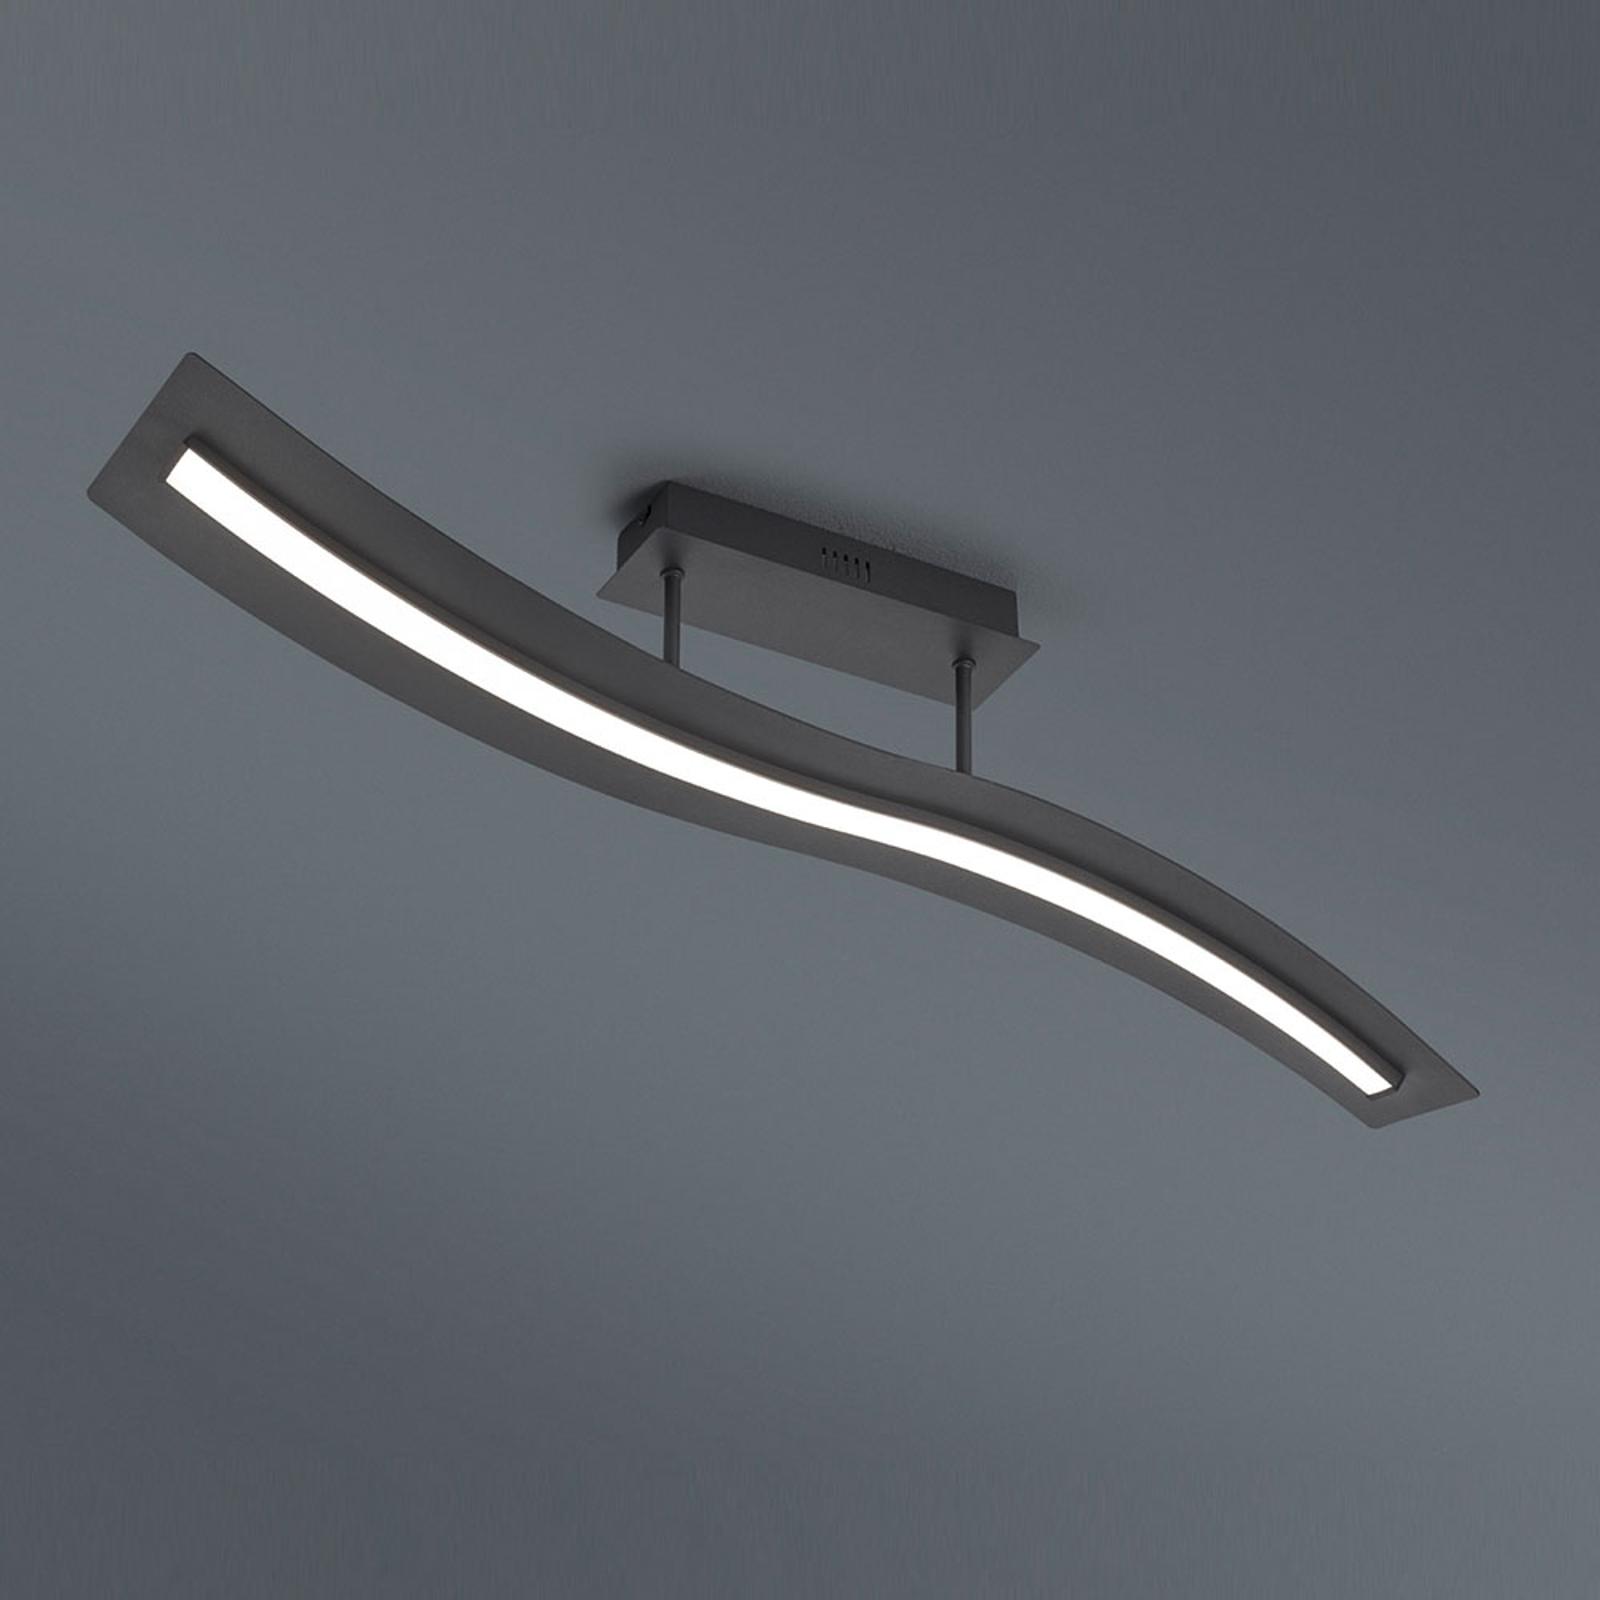 LED-taklampe Salerno, Switchdim, matt svart